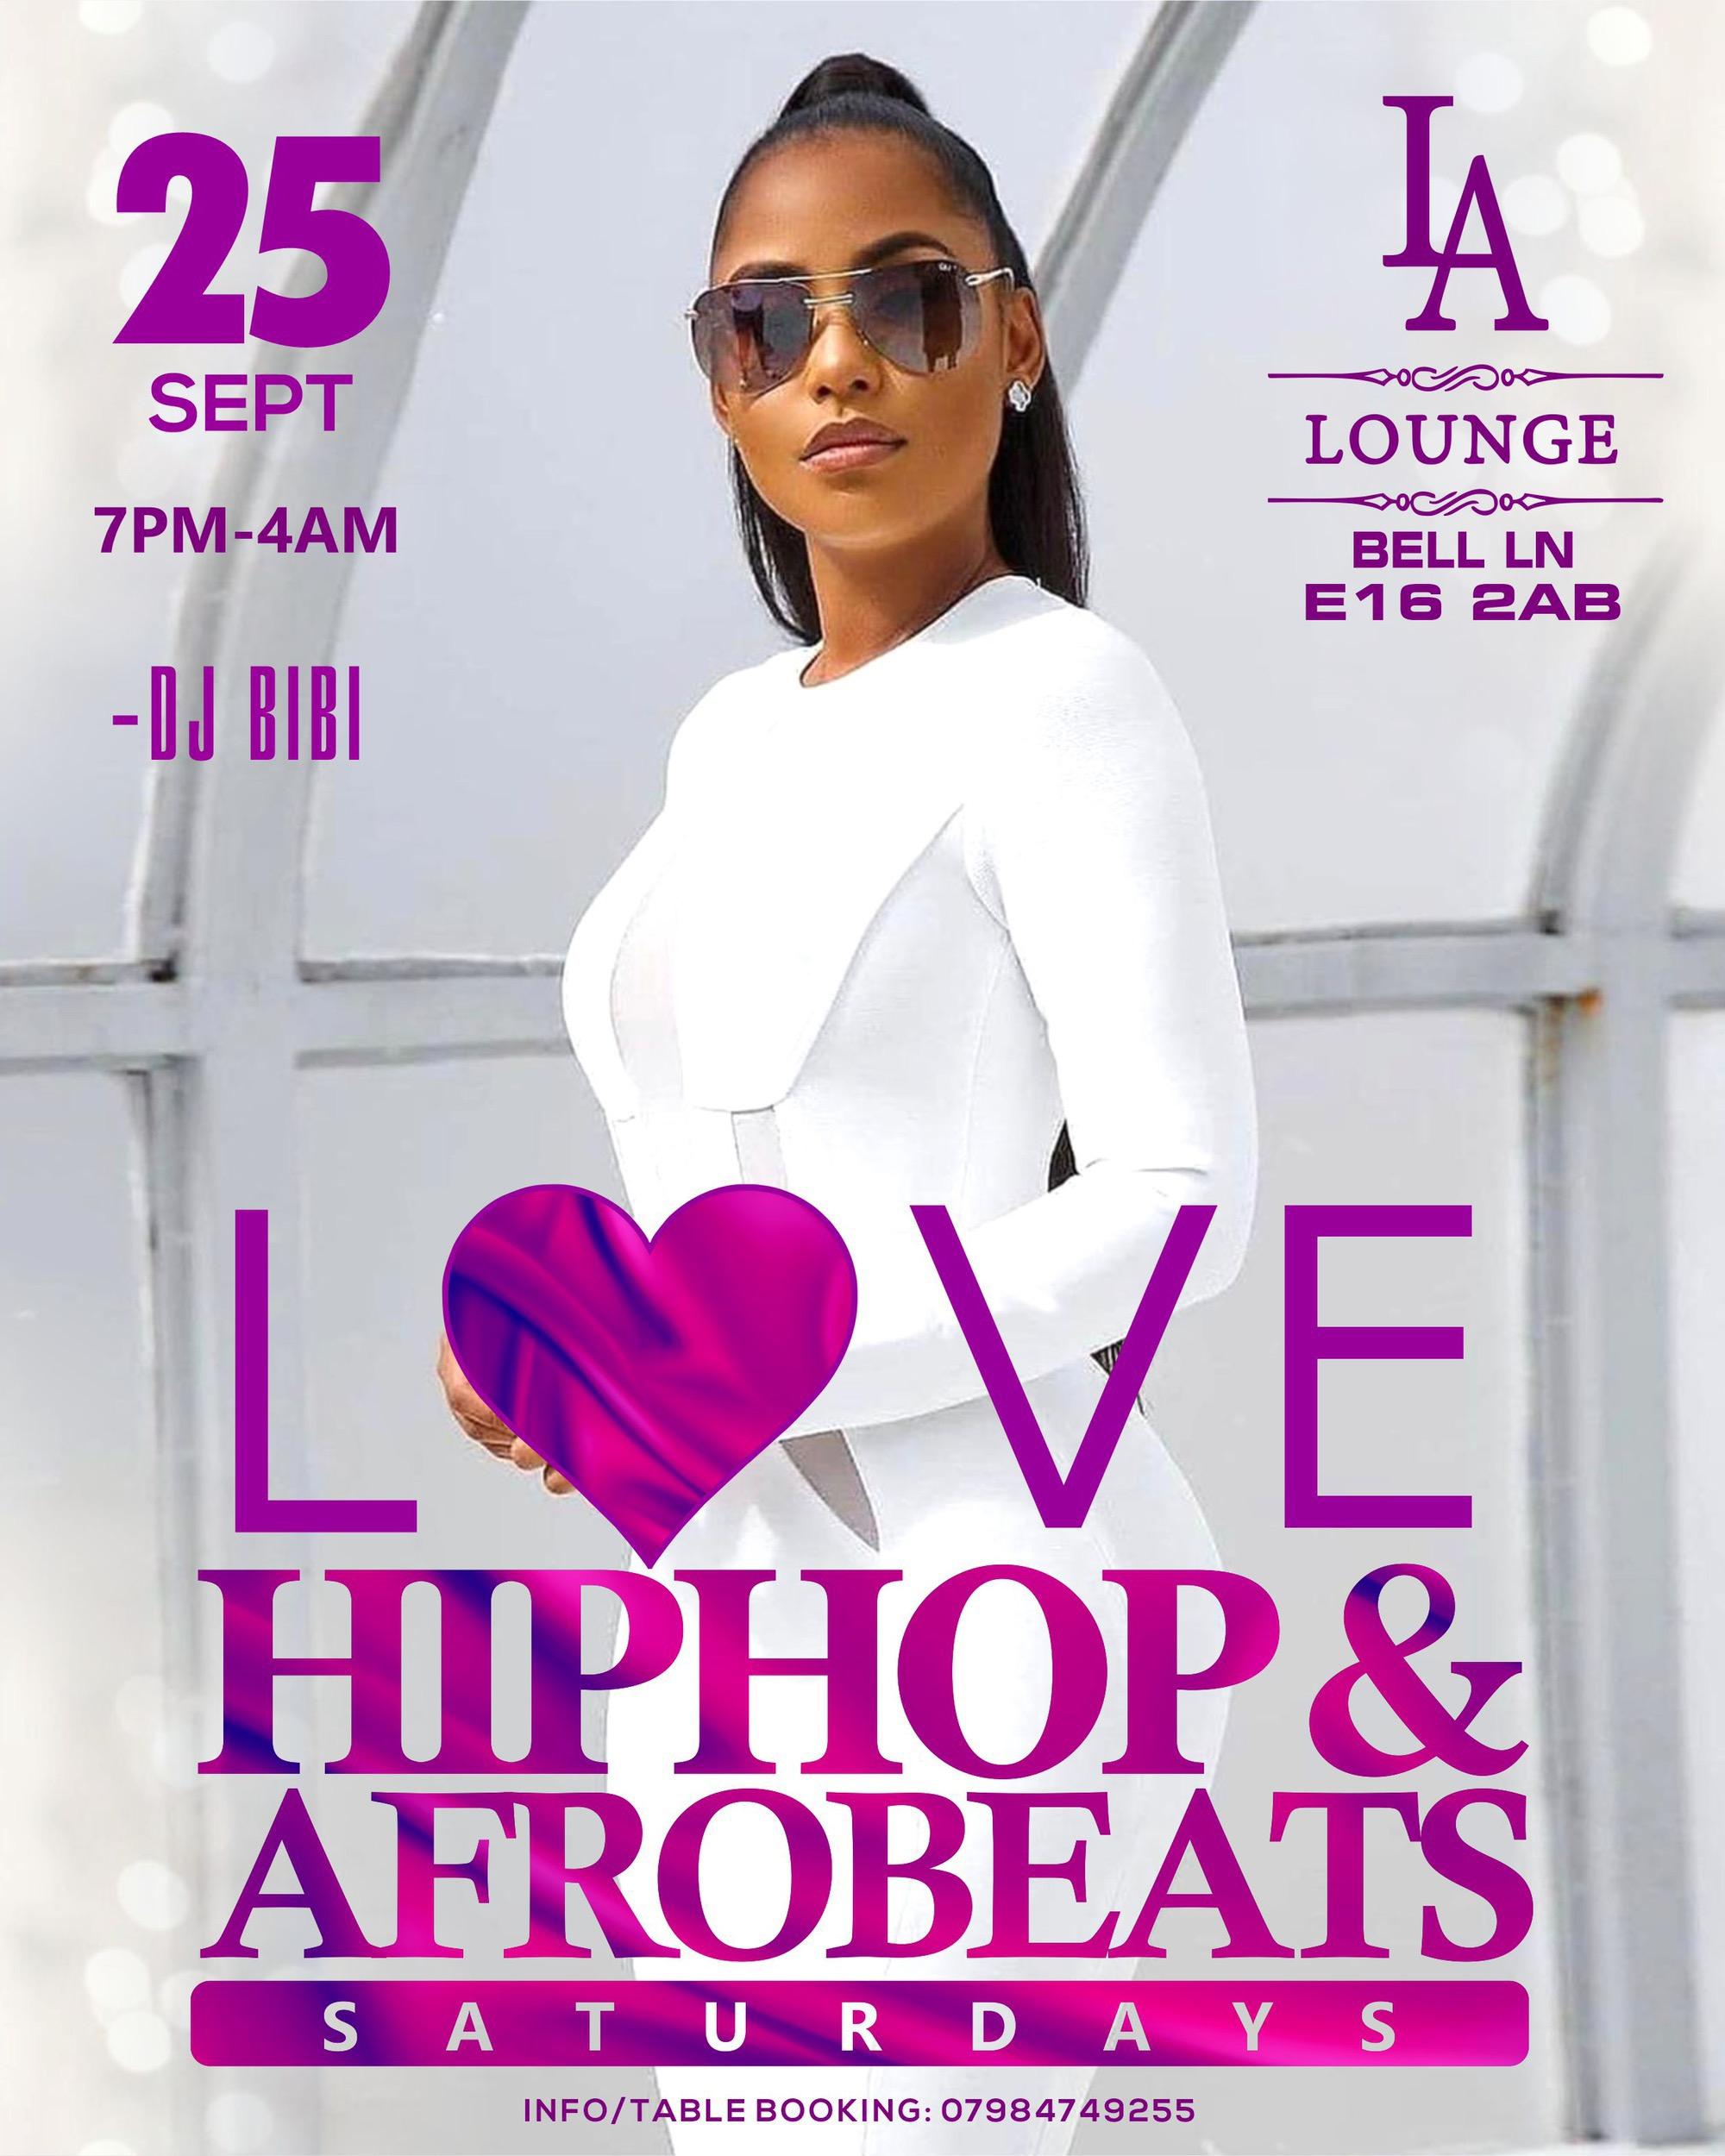 ♛ Love HipHop & Afrobeats ♛